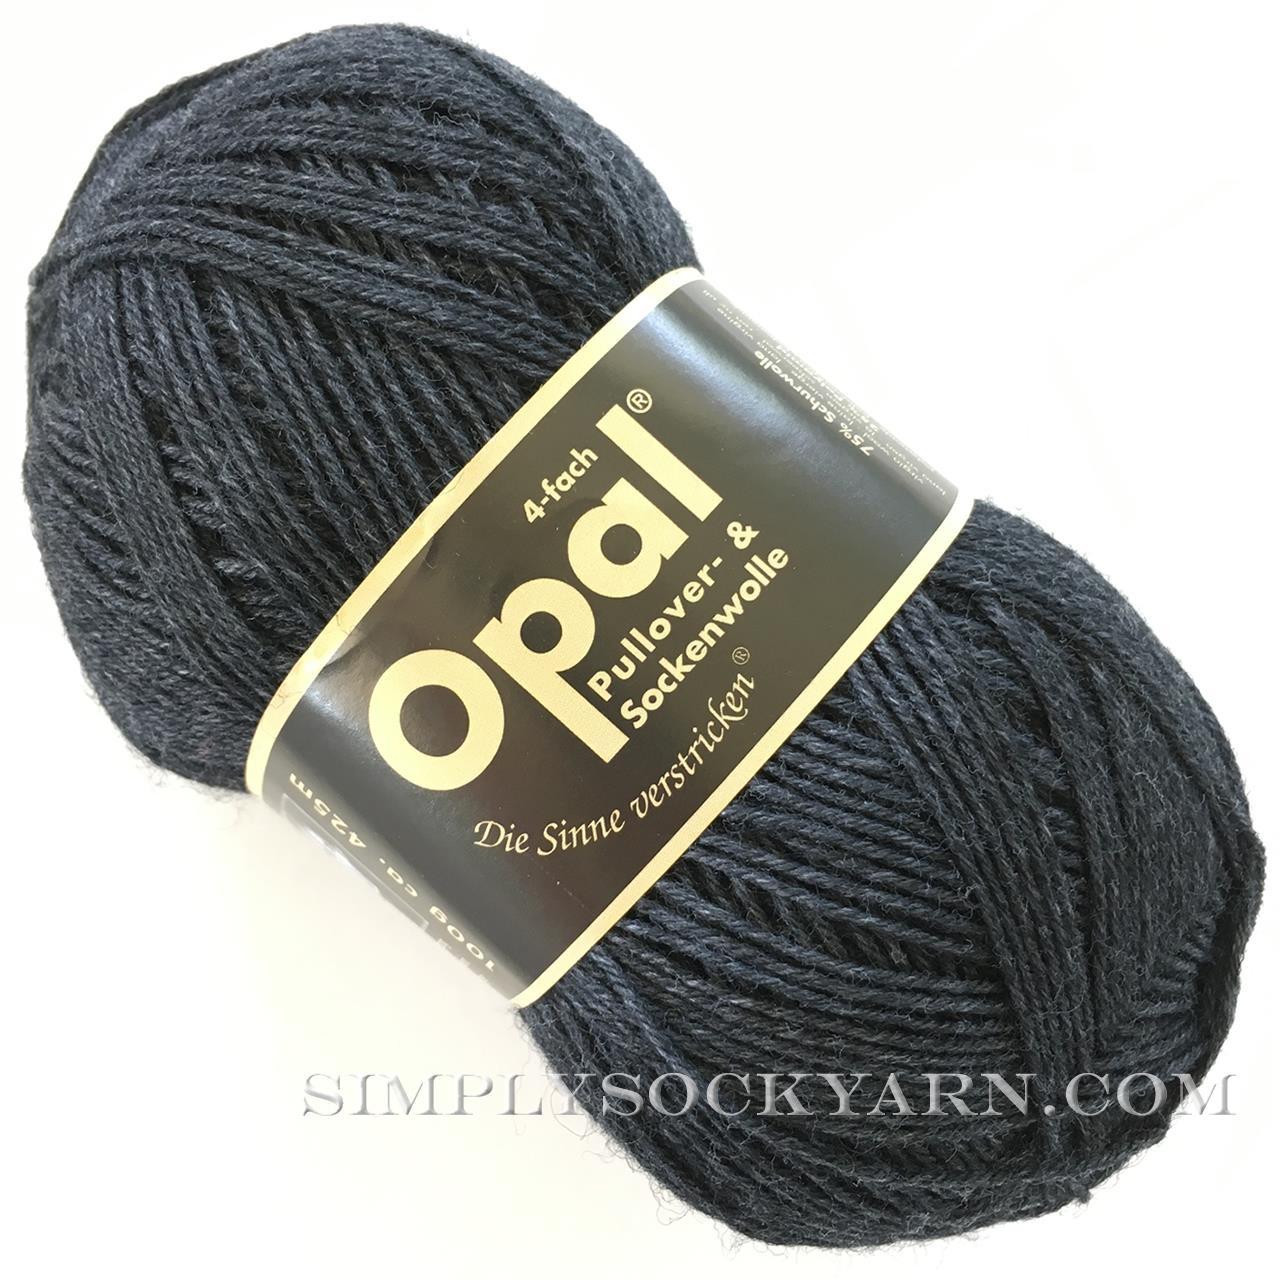 Opal Uni Solid 5191 Dk Gray -